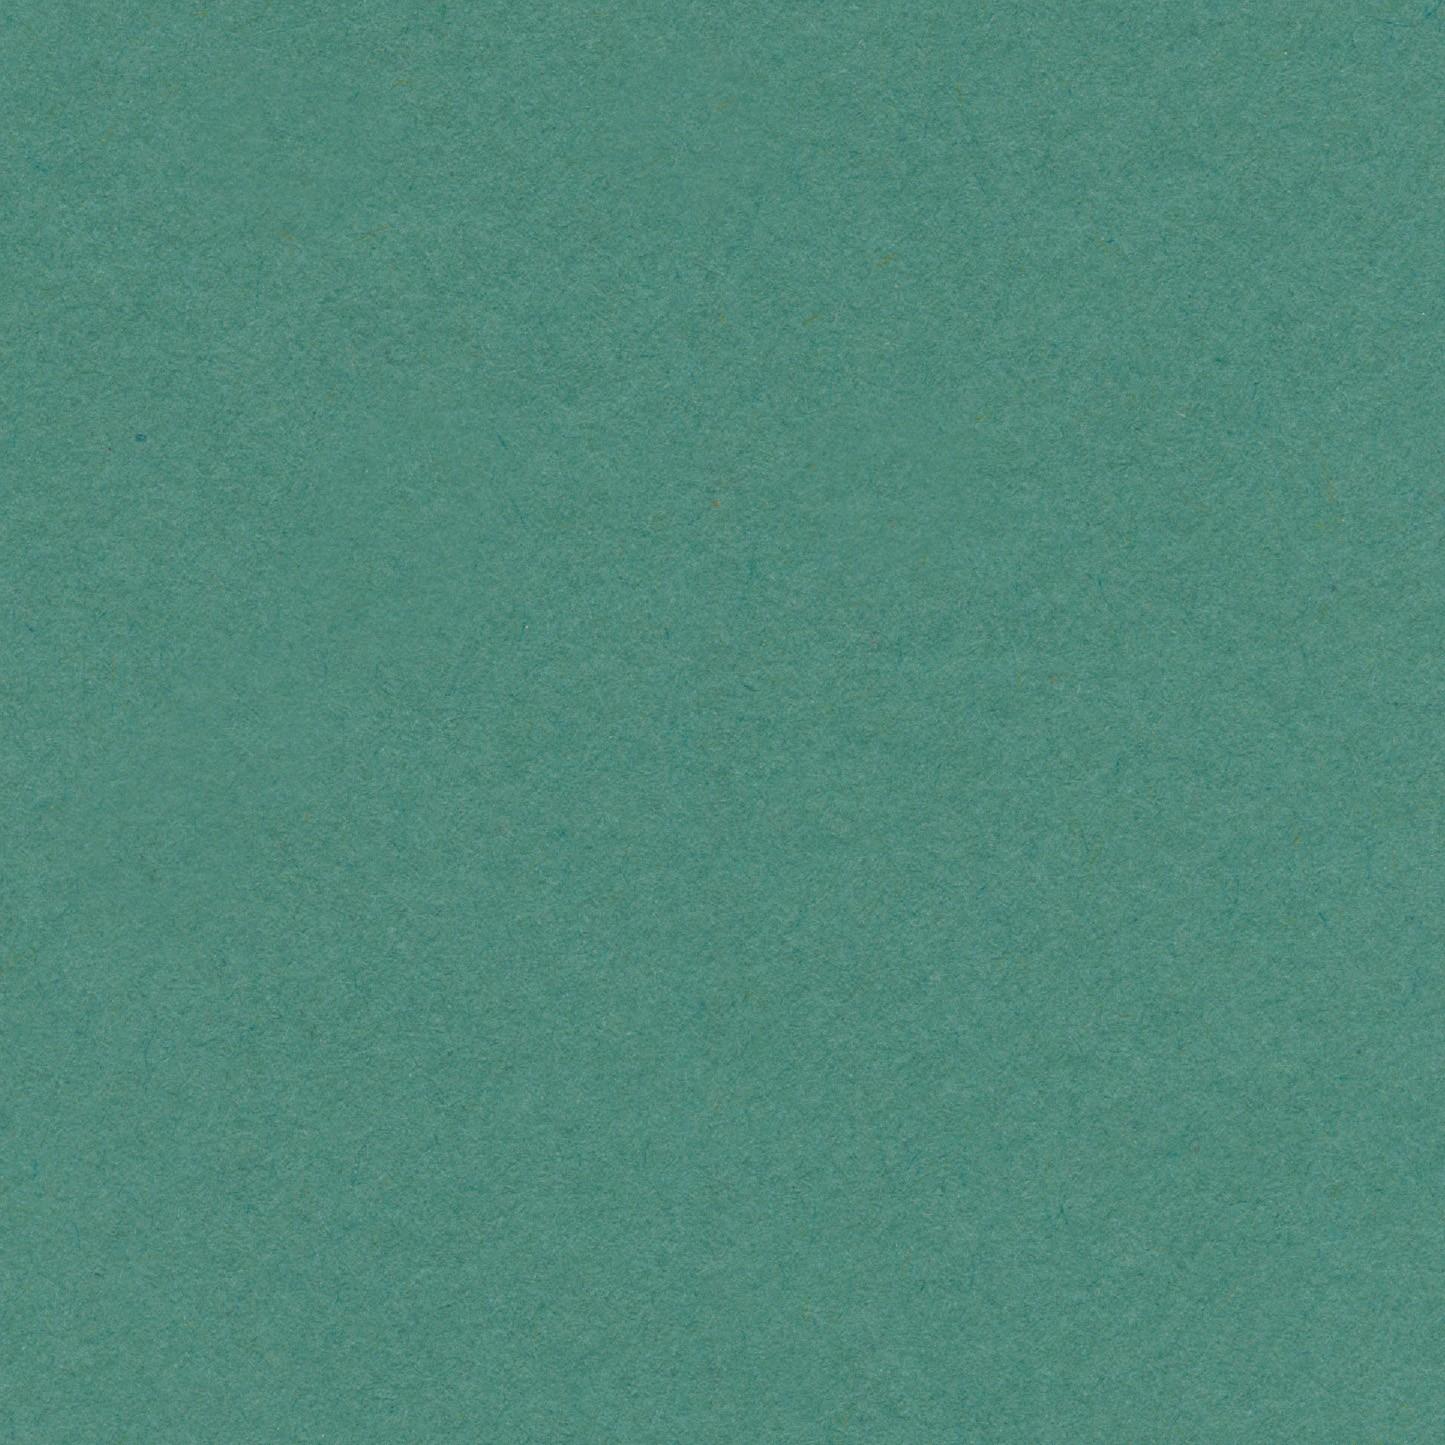 Green - Emerald 135gsm